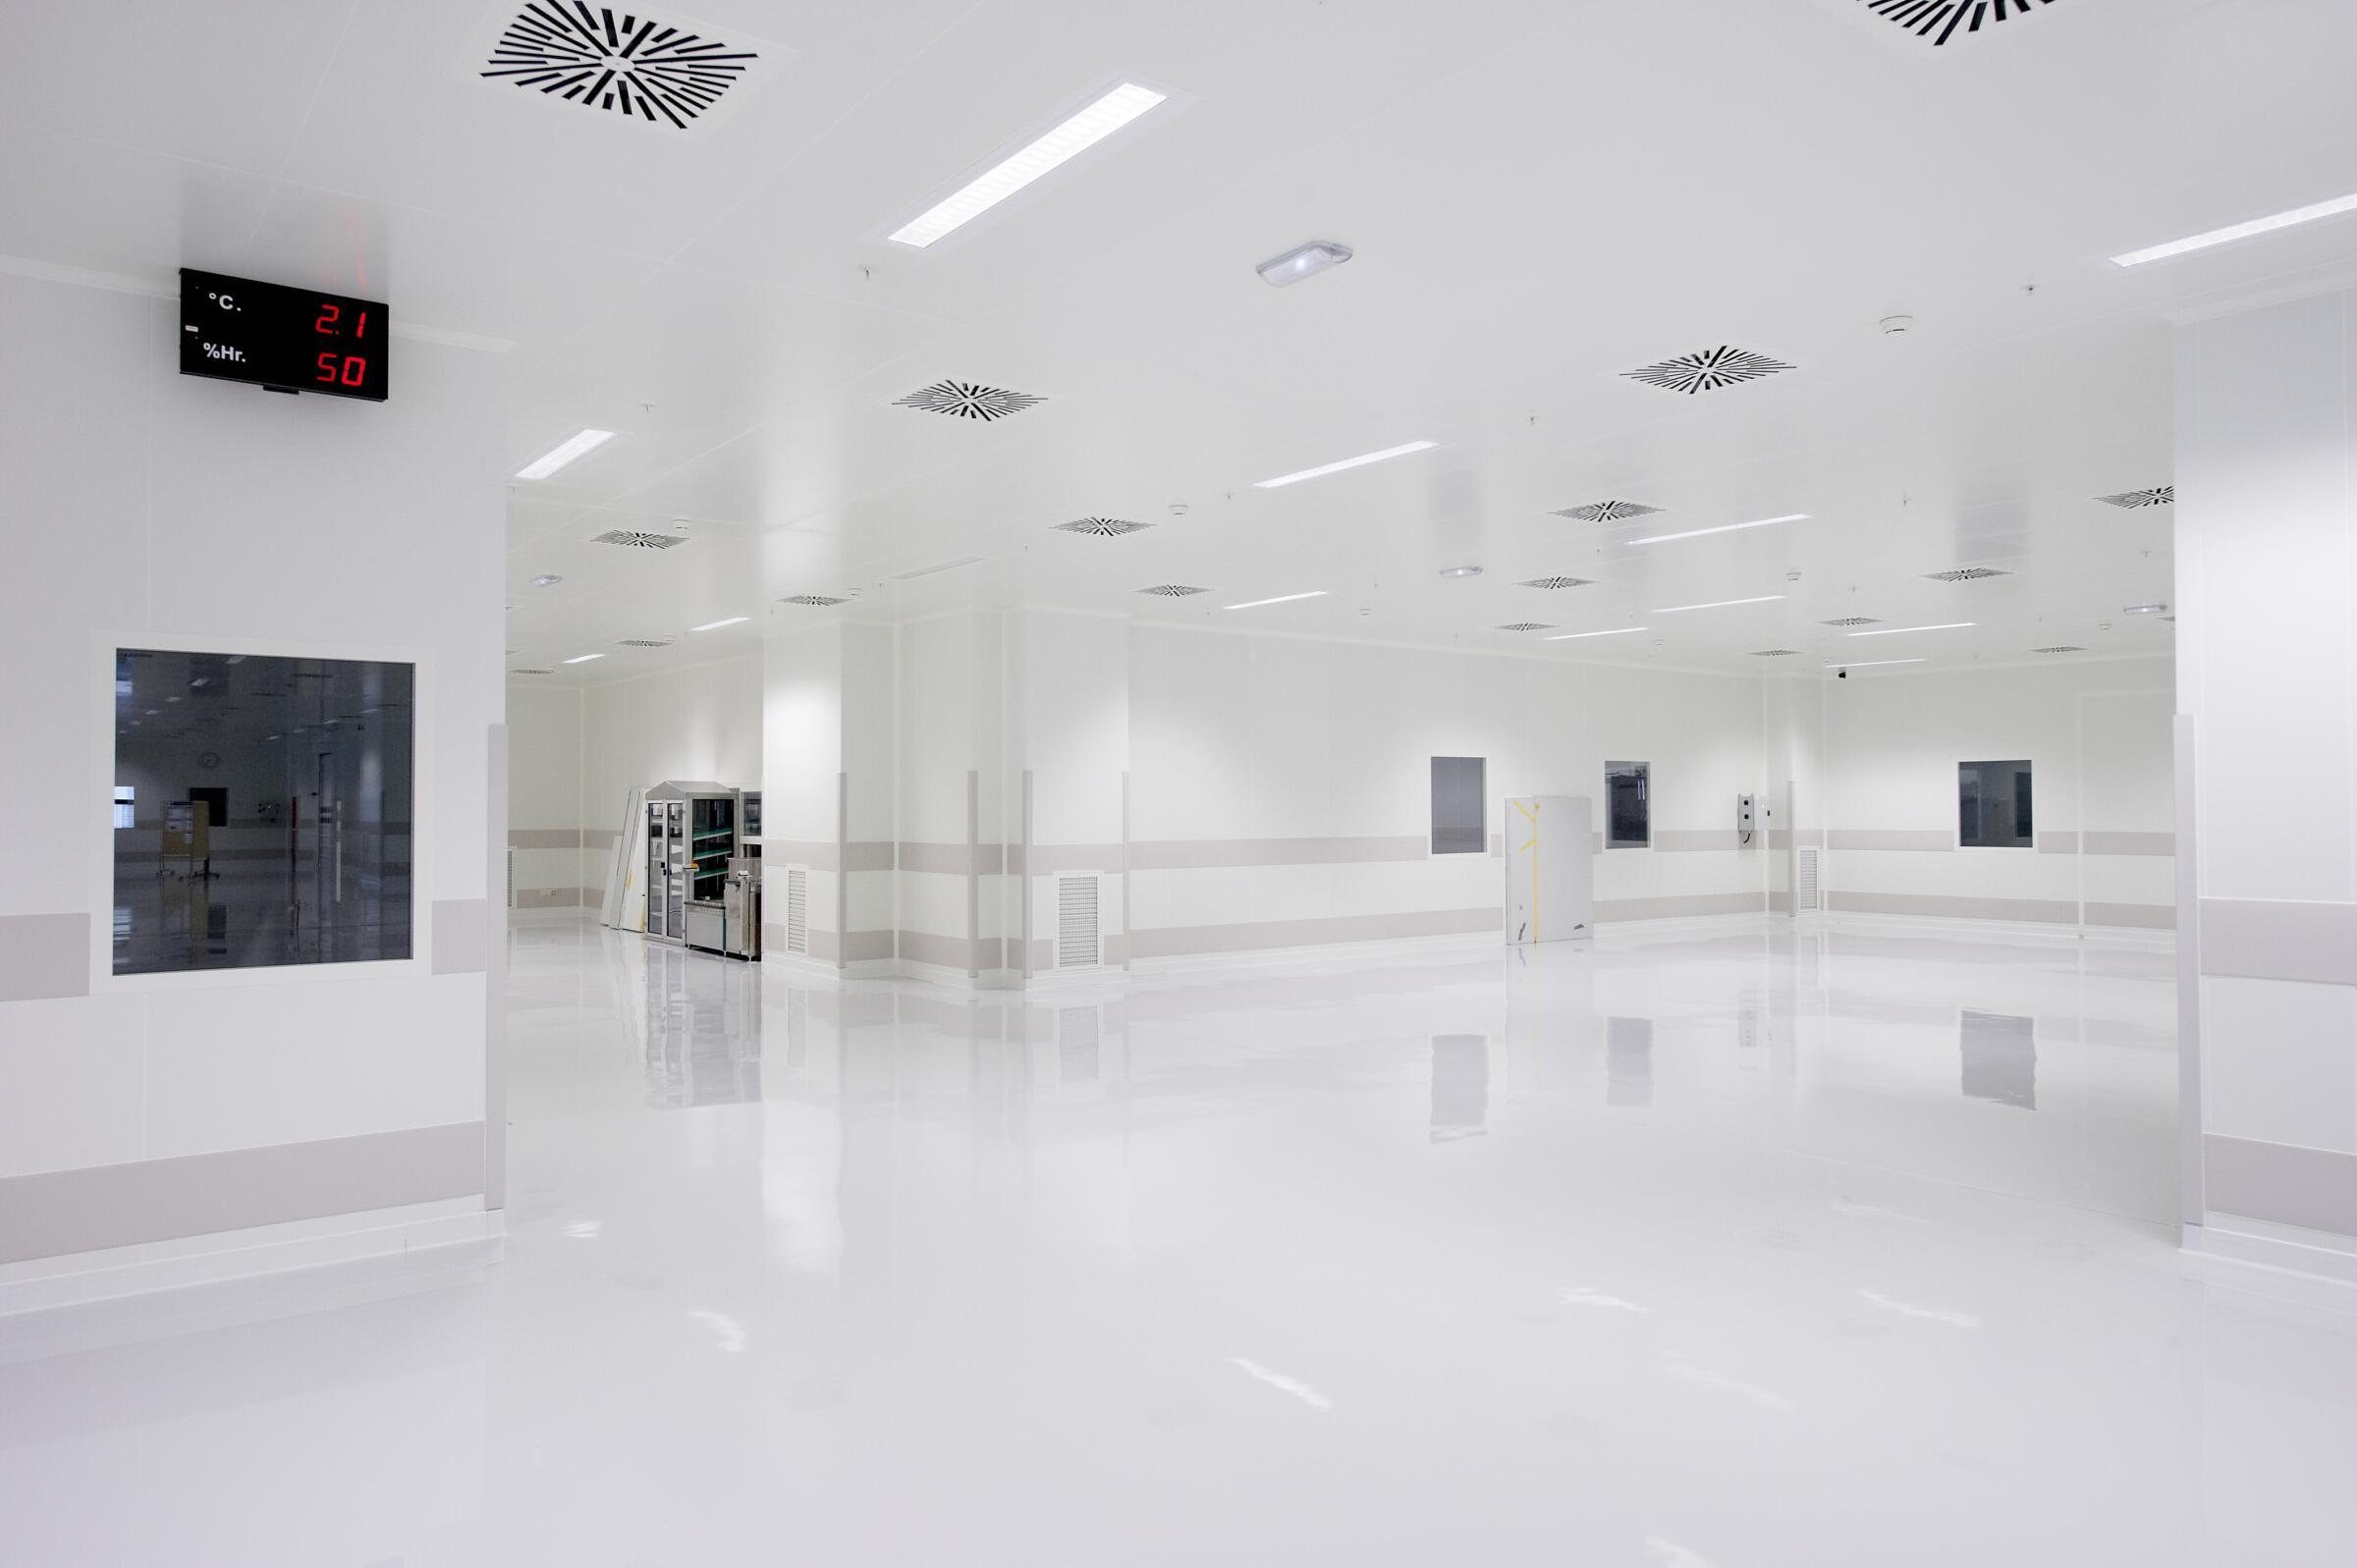 Dagard, cleanroom manufacturer